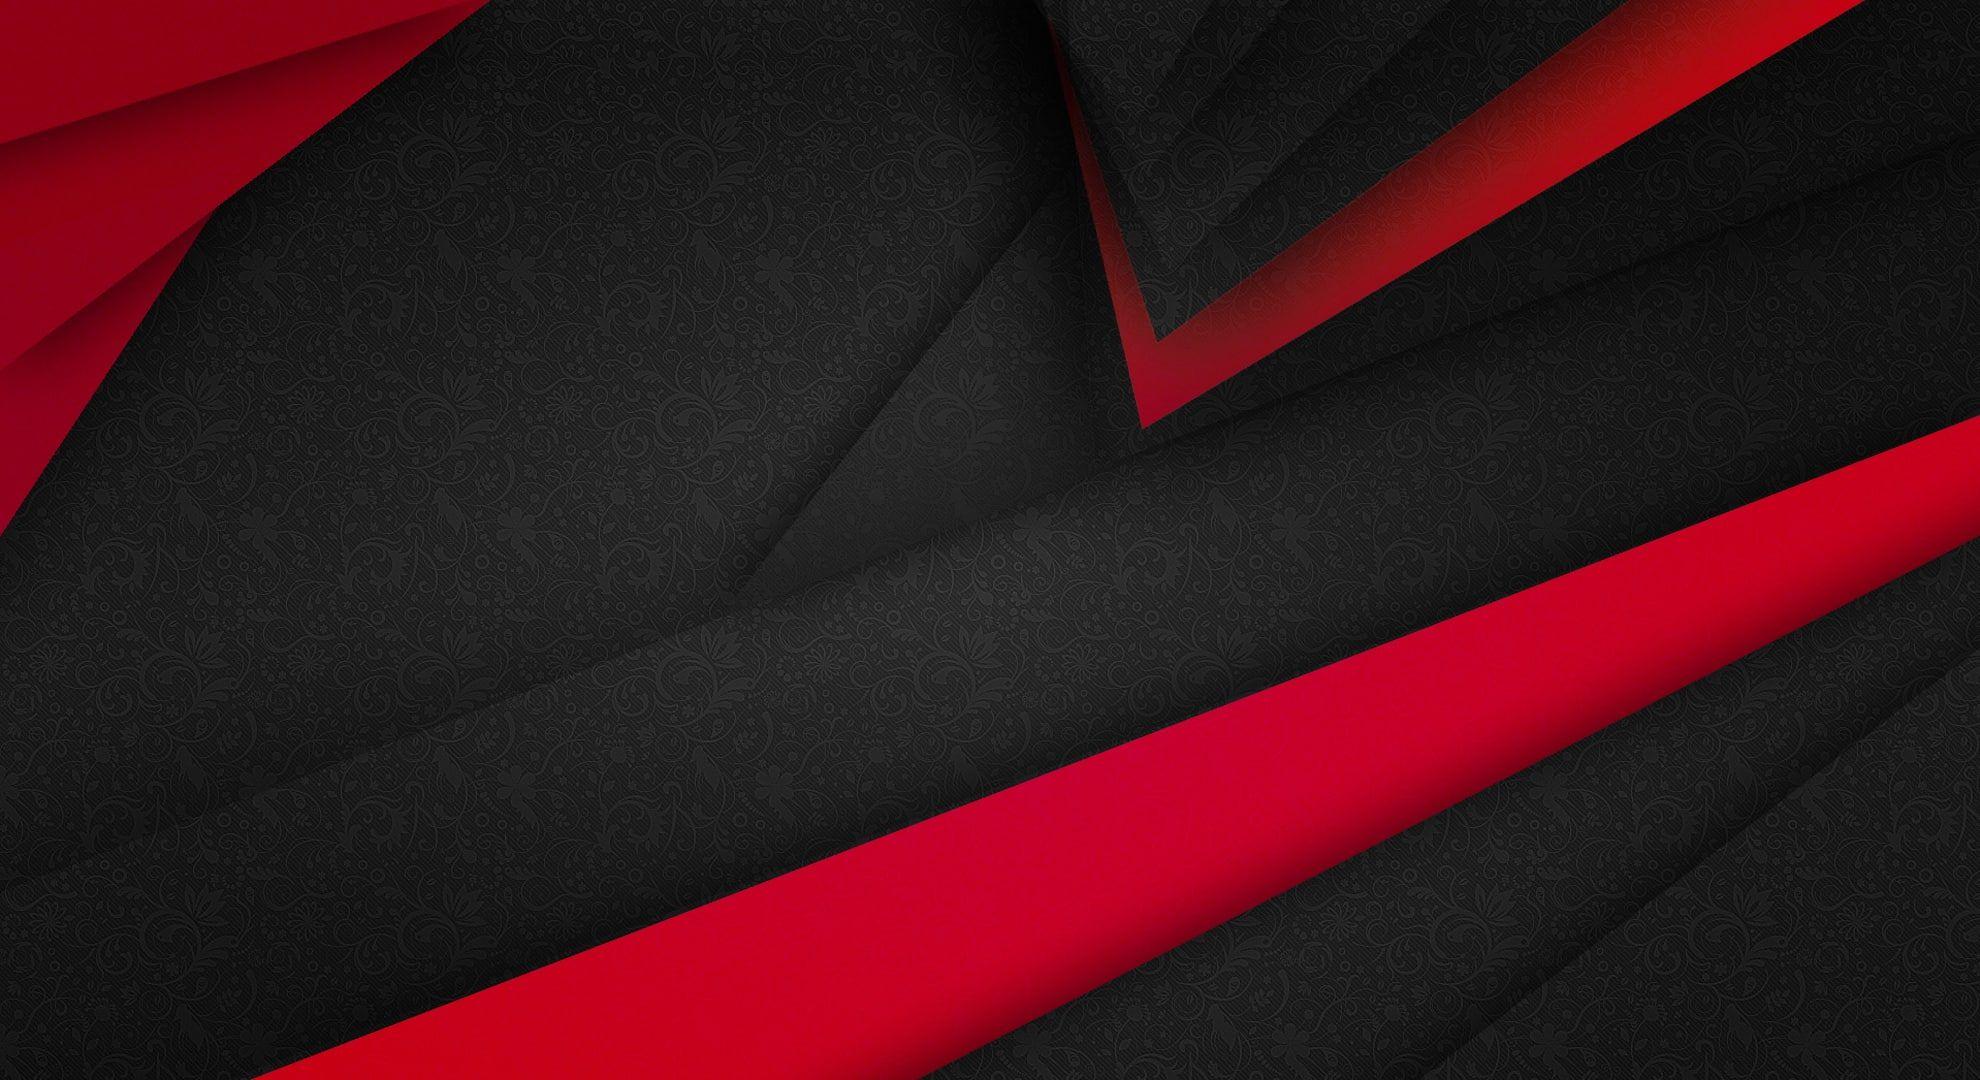 Black Textile Red Black Texture Beautiful Background Amazing Elite Cool Gray Zero Zed L Graphic Design Images Silhouette Photos Silhouette Pictures